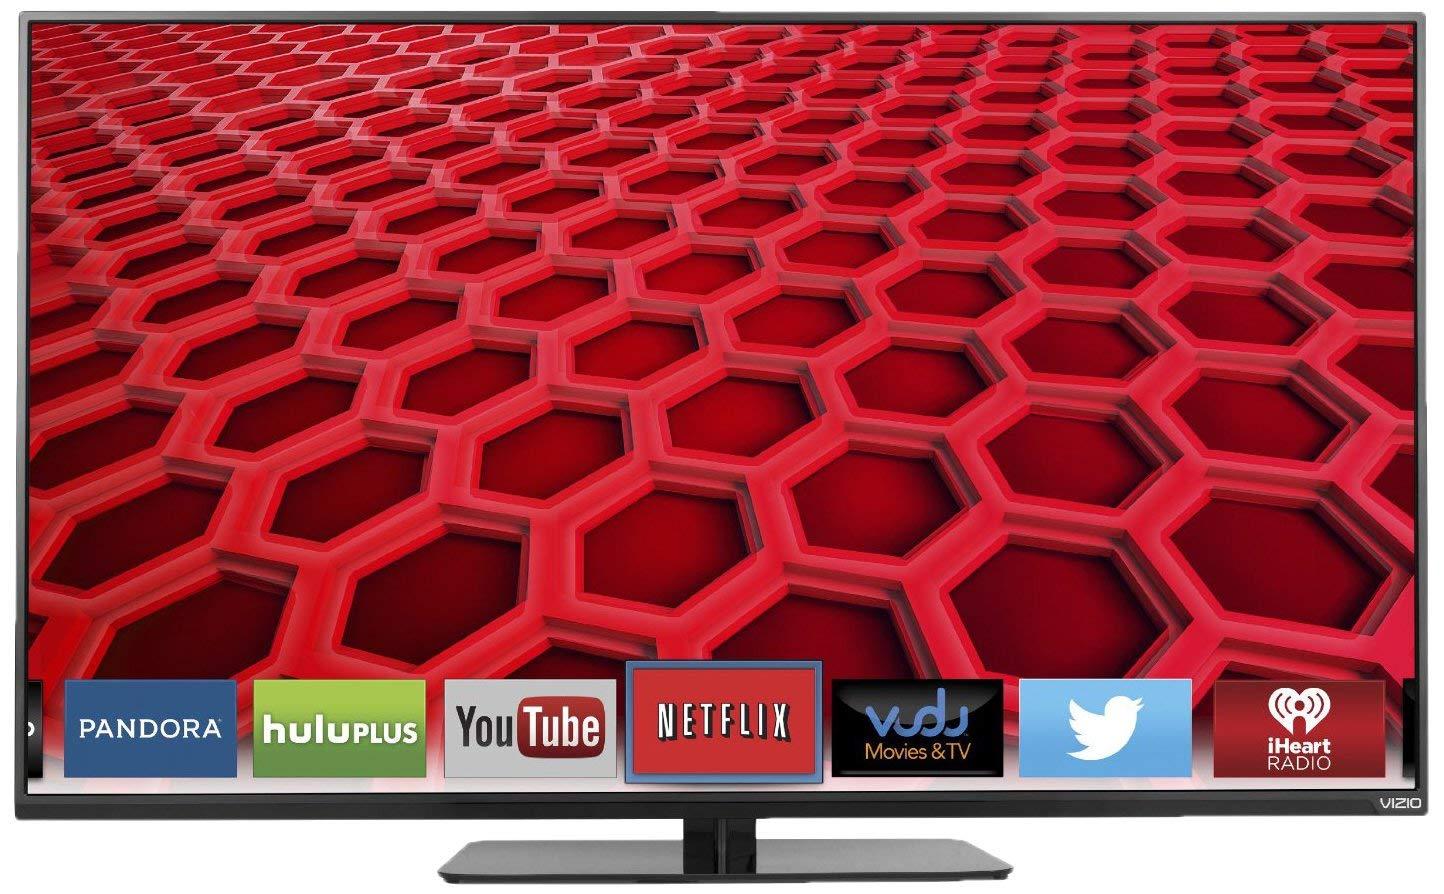 An image of VIZIO E480i-B2 48-Inch FHD LED TV | Your TV Set